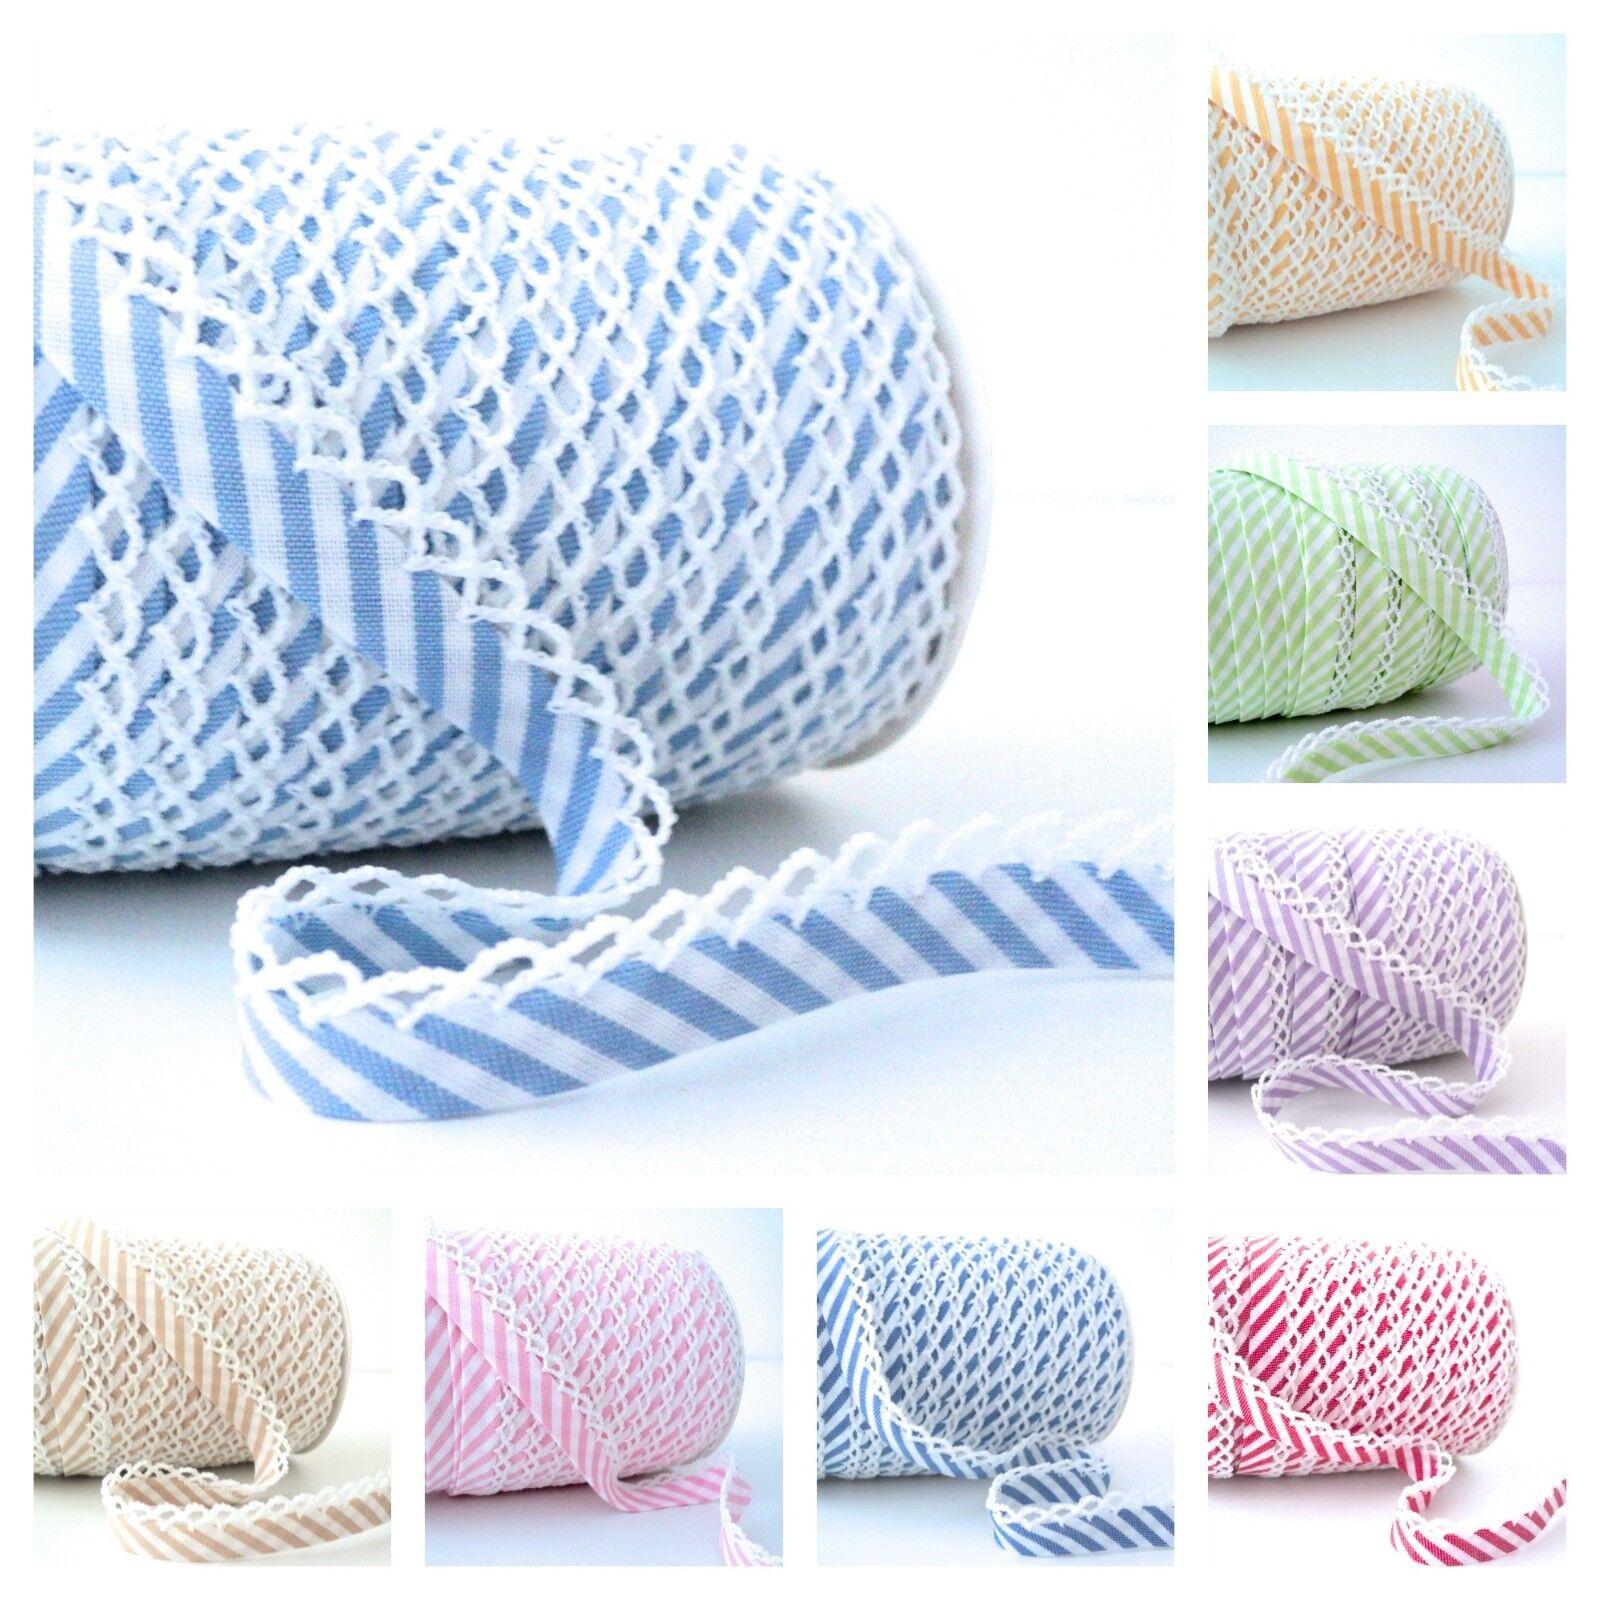 per metre beautiful picot lace edge heart design folded bias binding 14mm wide